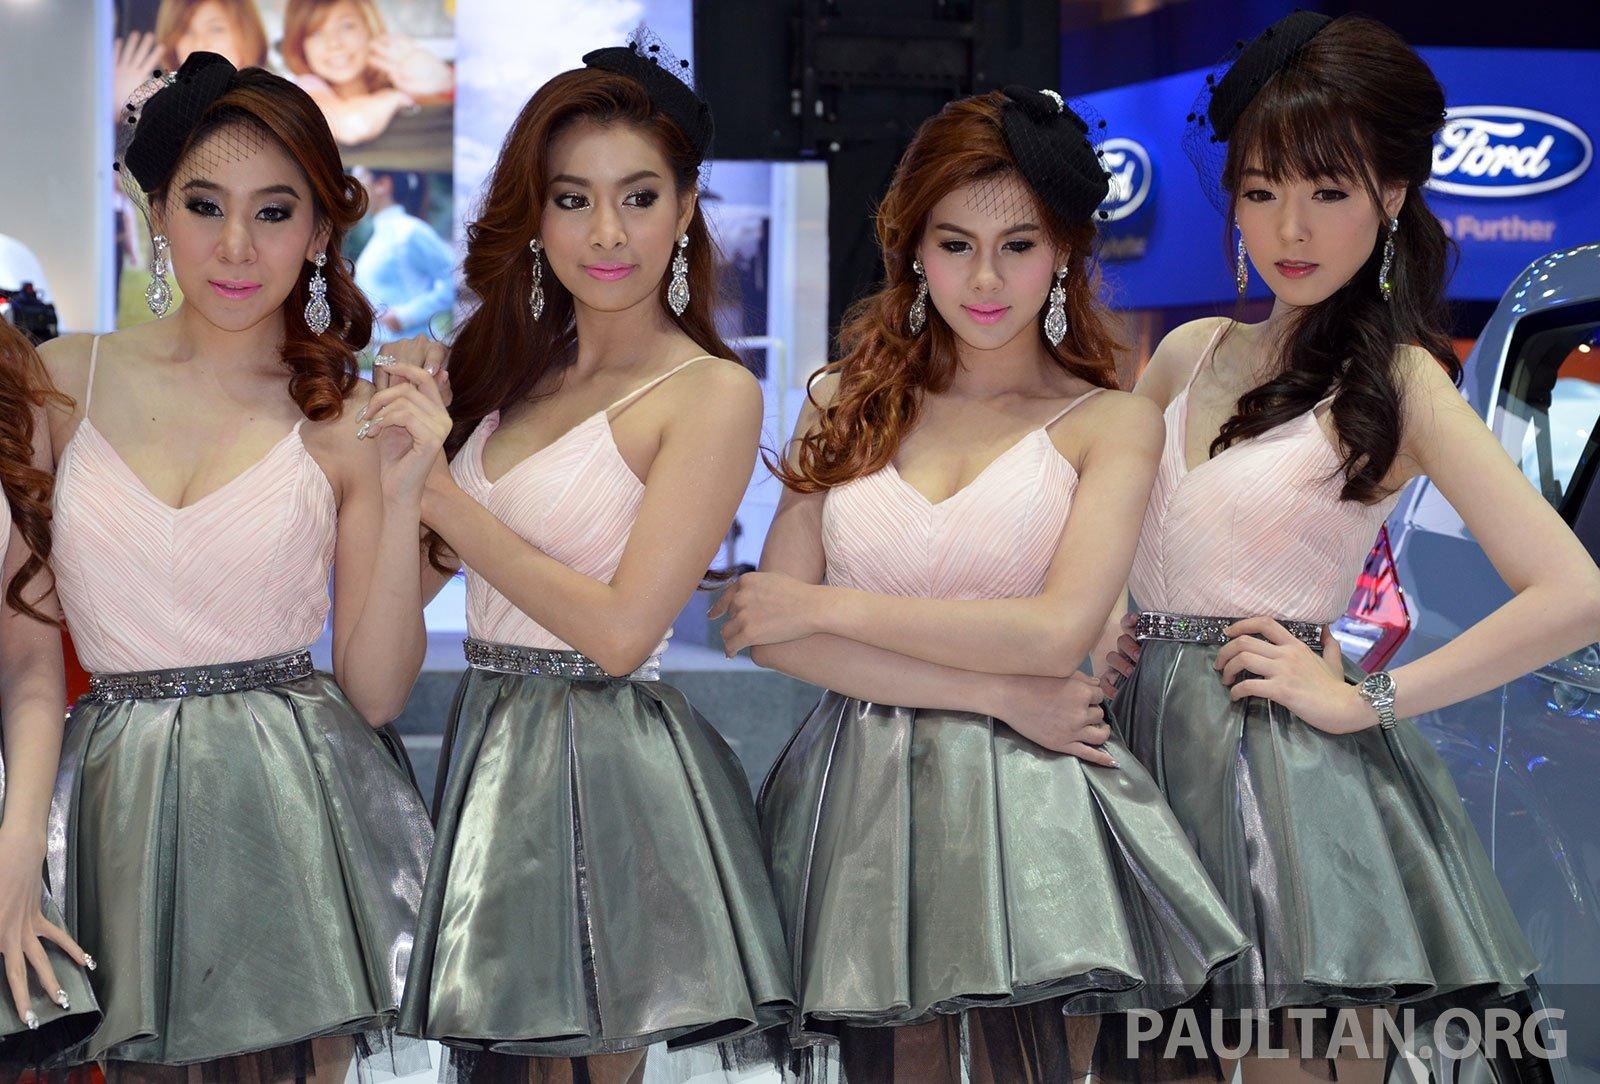 The girls of the 2014 Bangkok Motor Show – Part 1 Image 238491